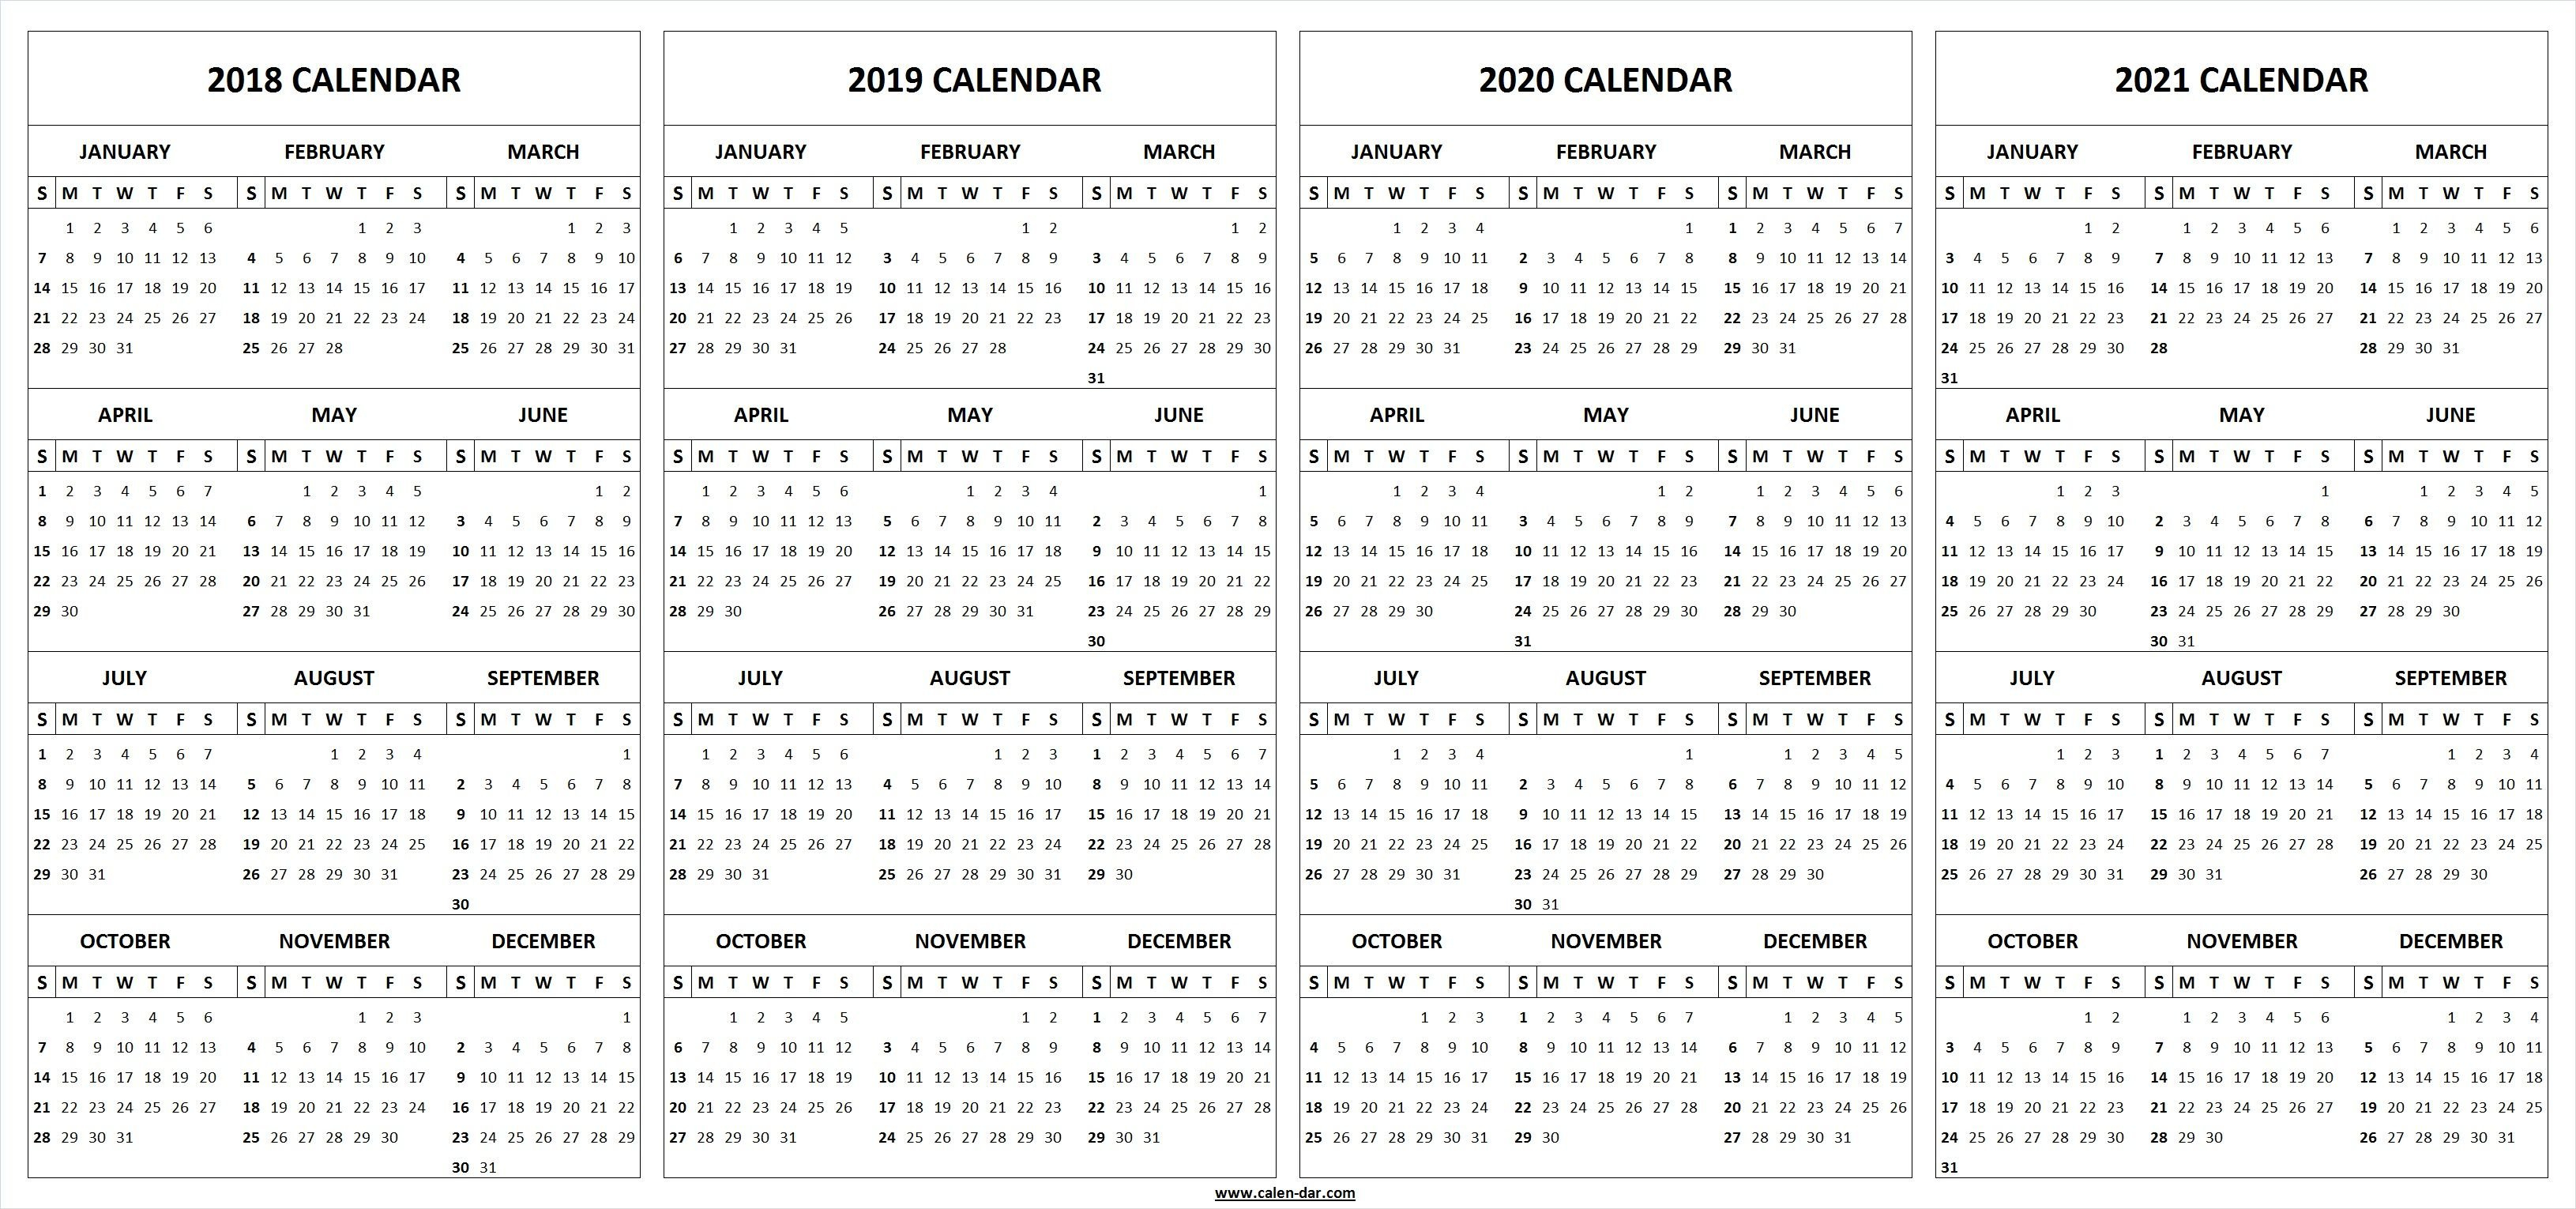 Printable 2018 2019 2020 2021 Calendar Template | Альбомы 4 Year Calendar Template